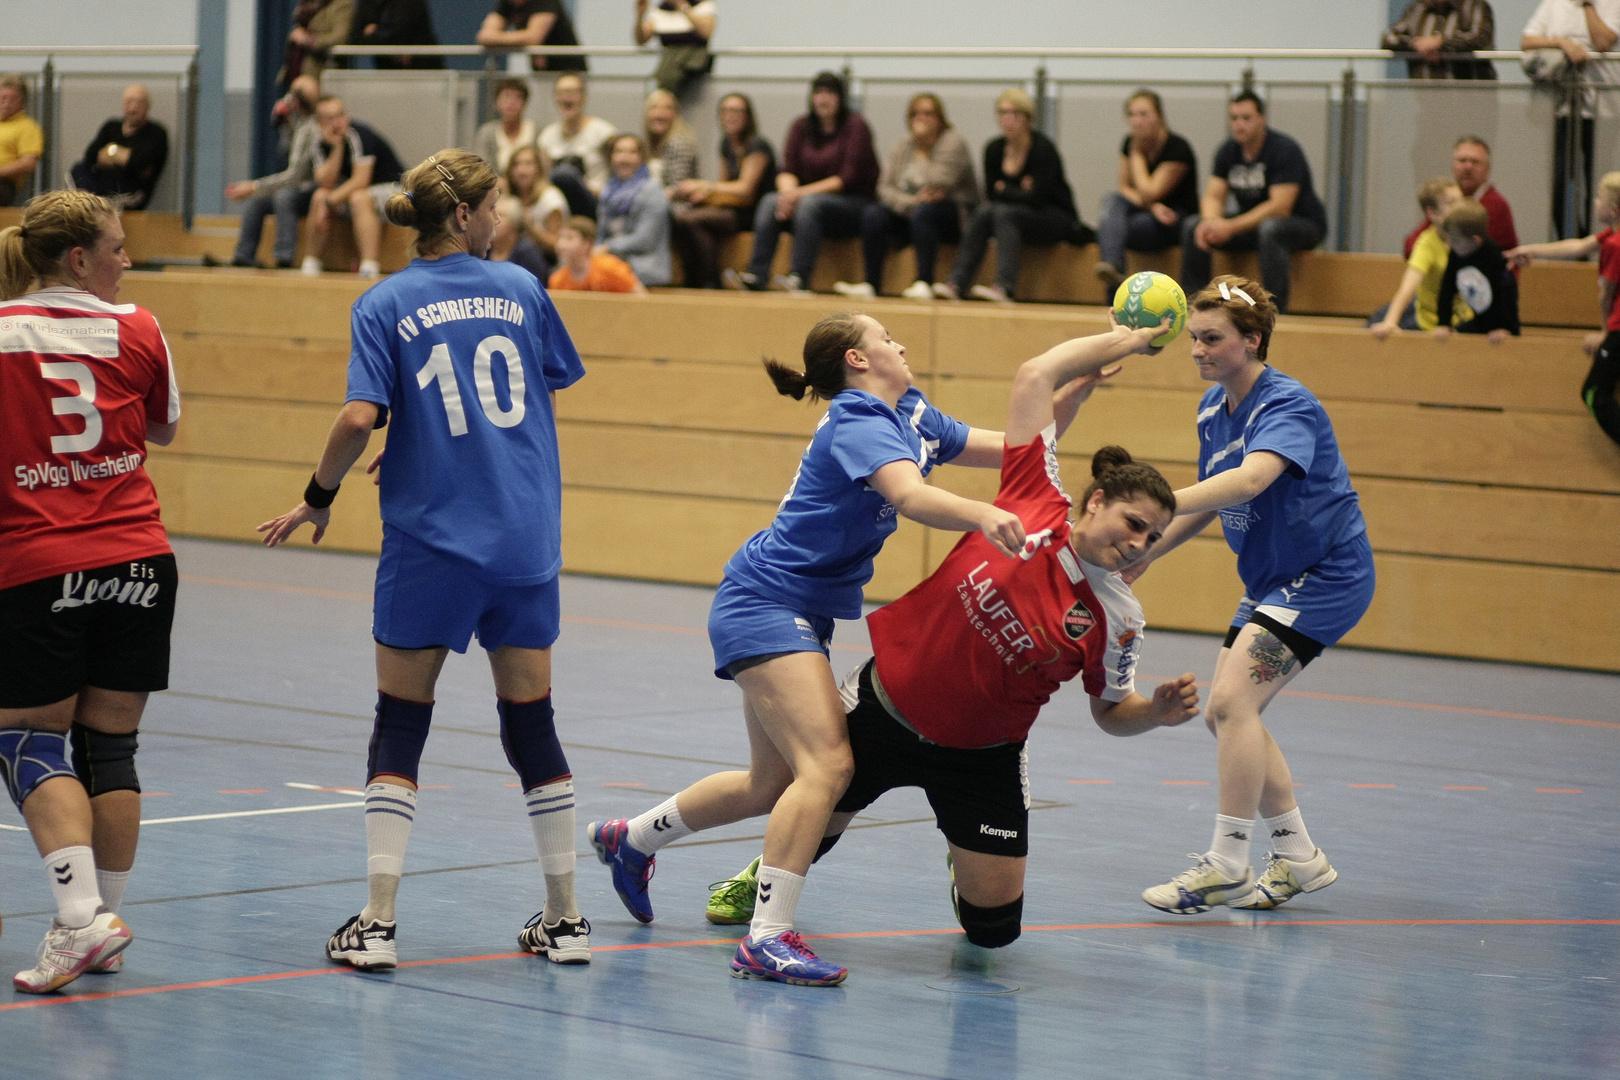 Handballsport - Angriff 6